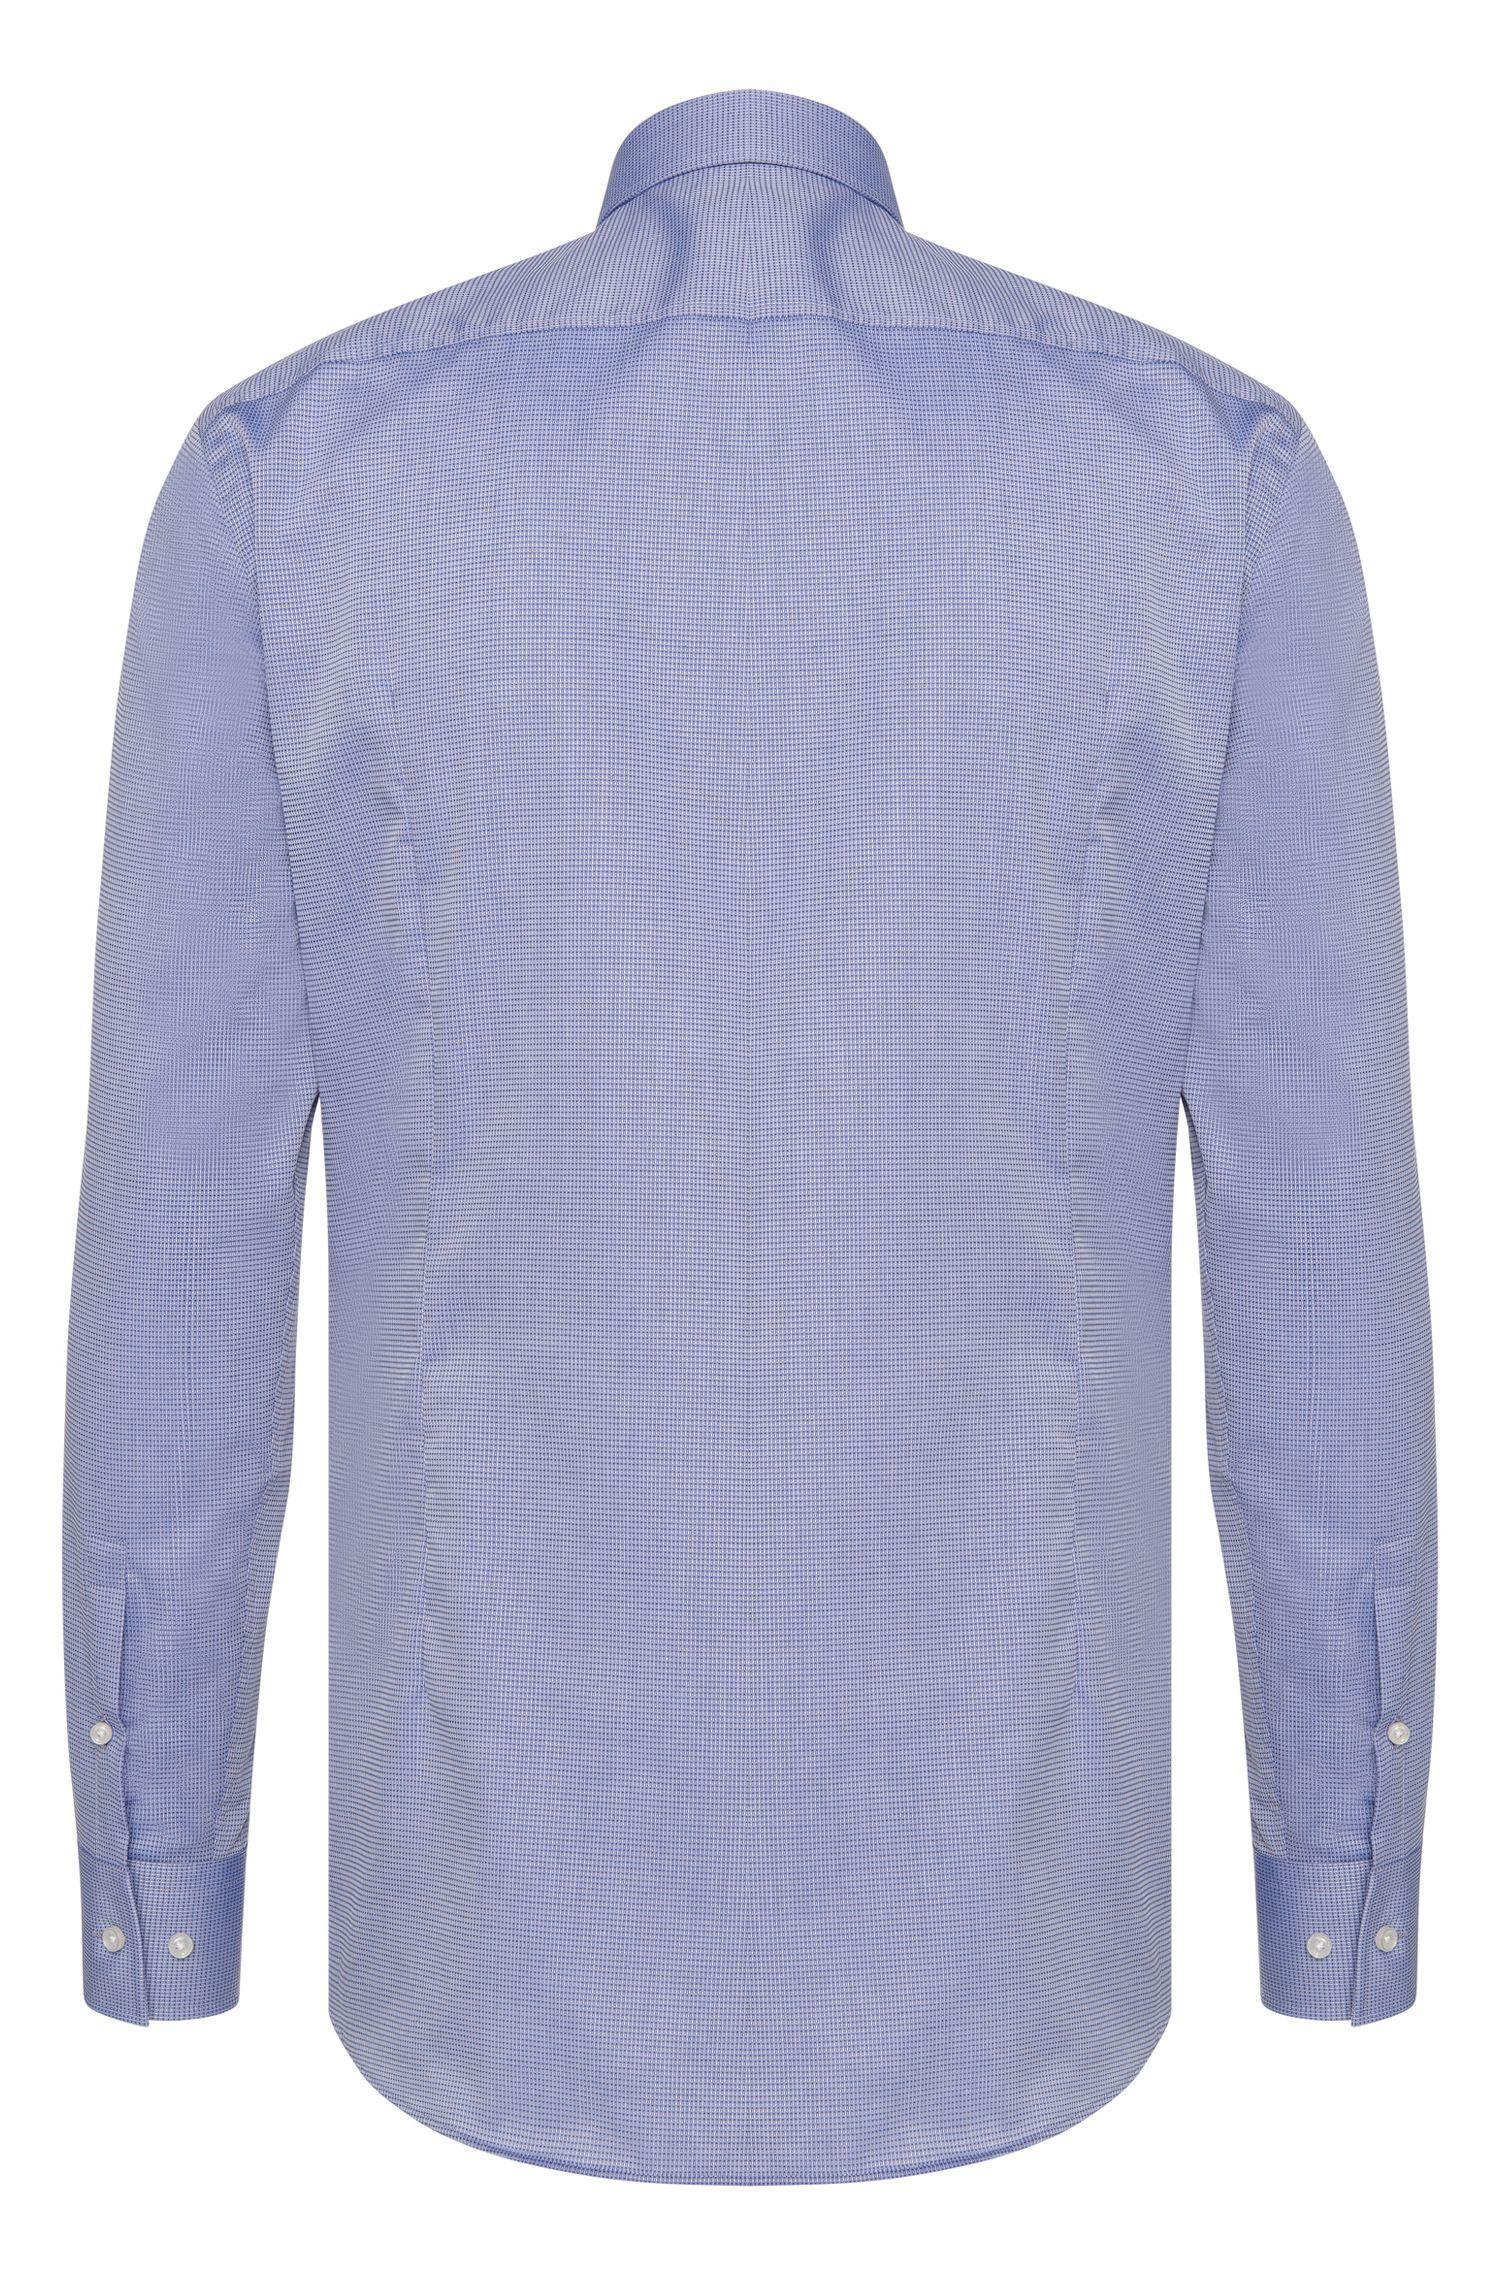 Gemustertes Slim-Fit Travel Line Hemd aus Baumwolle: 'Jenno'